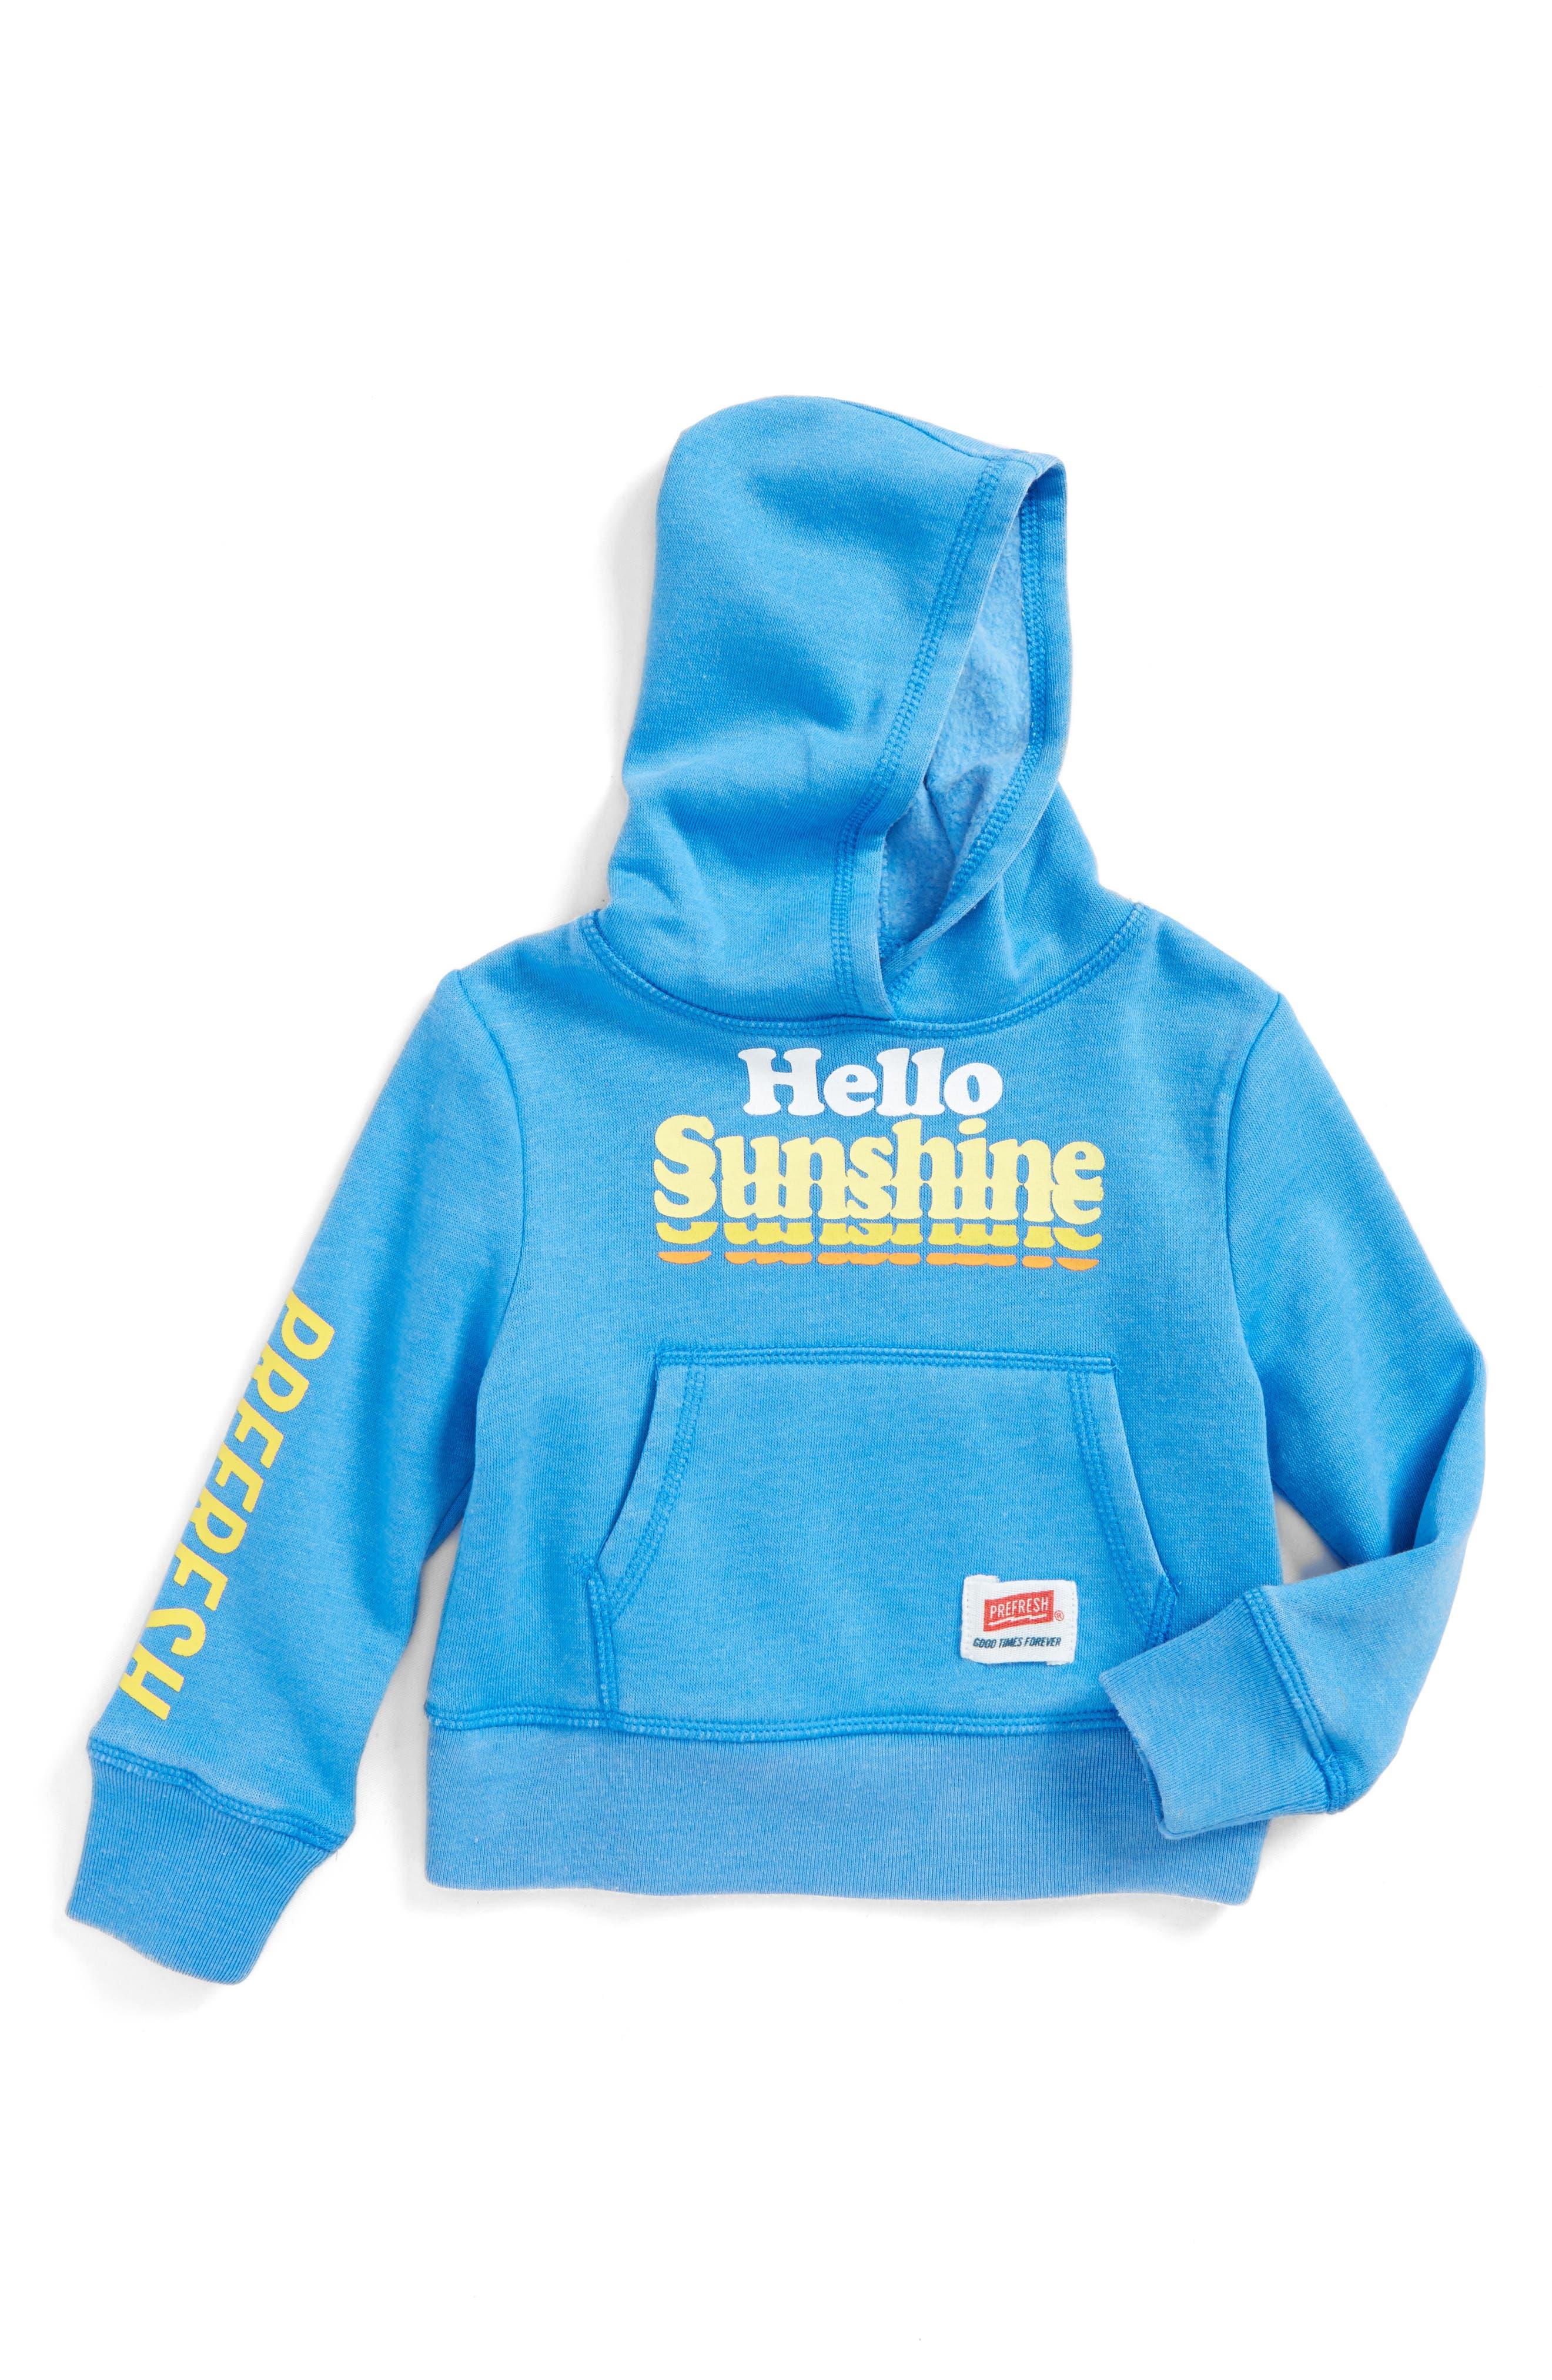 Alternate Image 1 Selected - Prefresh Hello Sunshine Hoodie (Baby Boys)